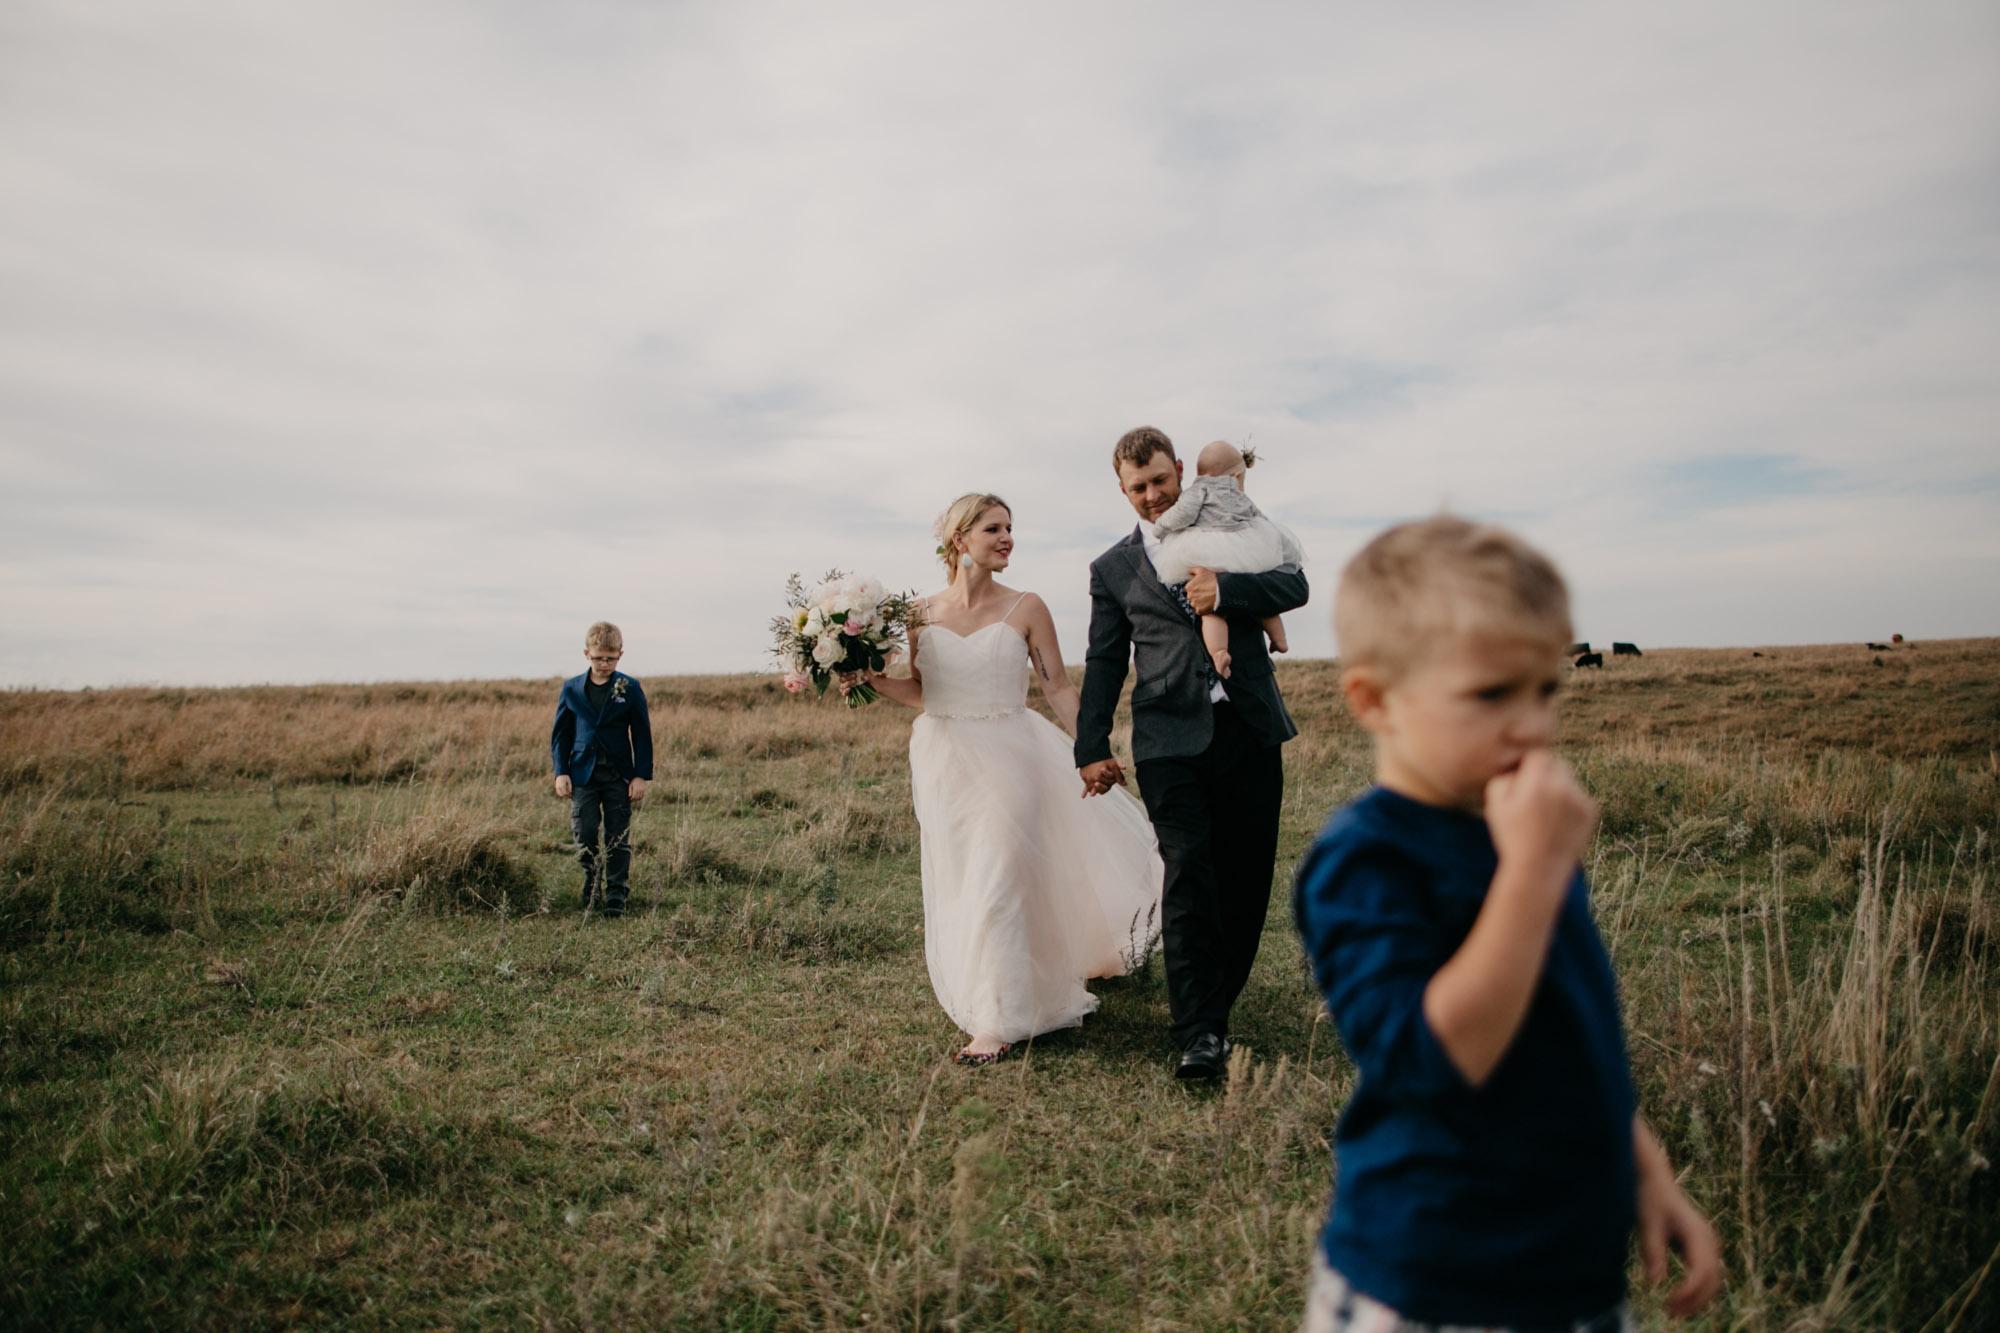 omaha-wedding-photographer-meghan-time-28.jpg